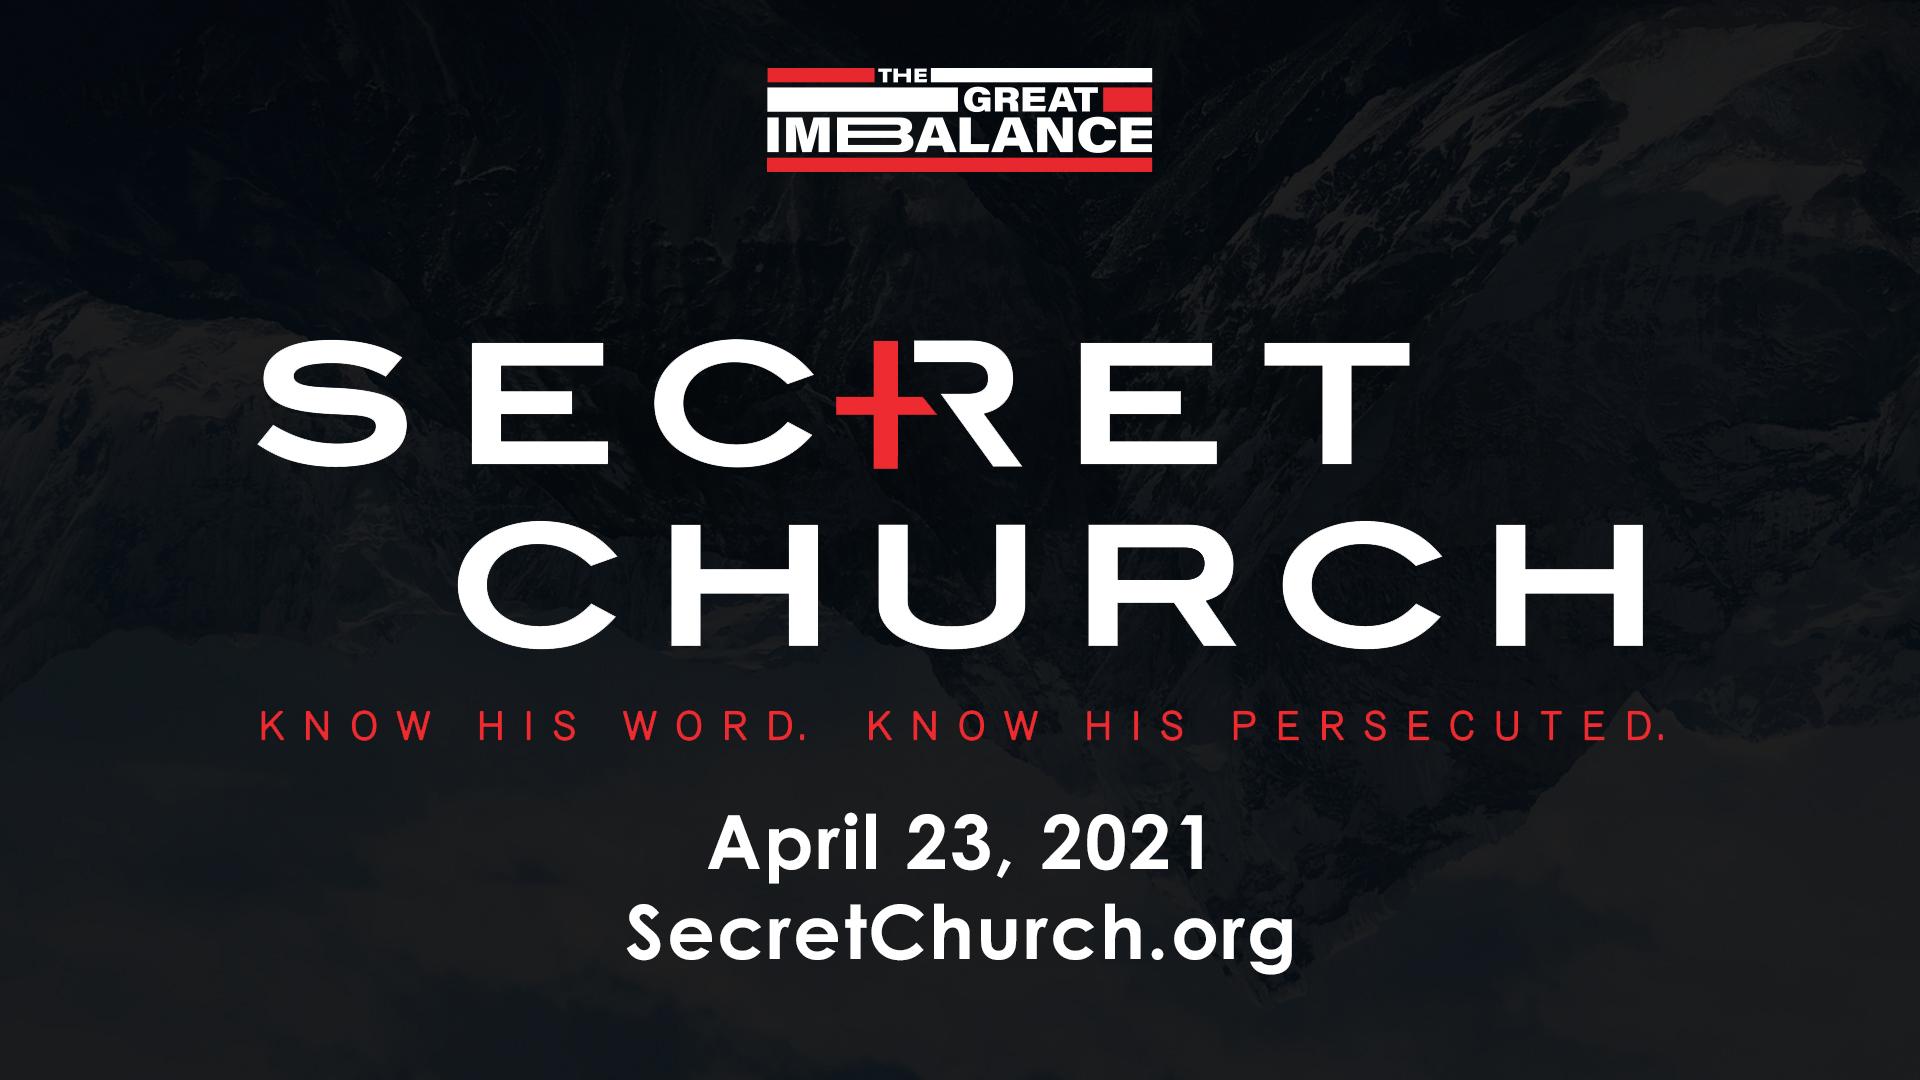 SECRET CHURCH – April 23, 2021